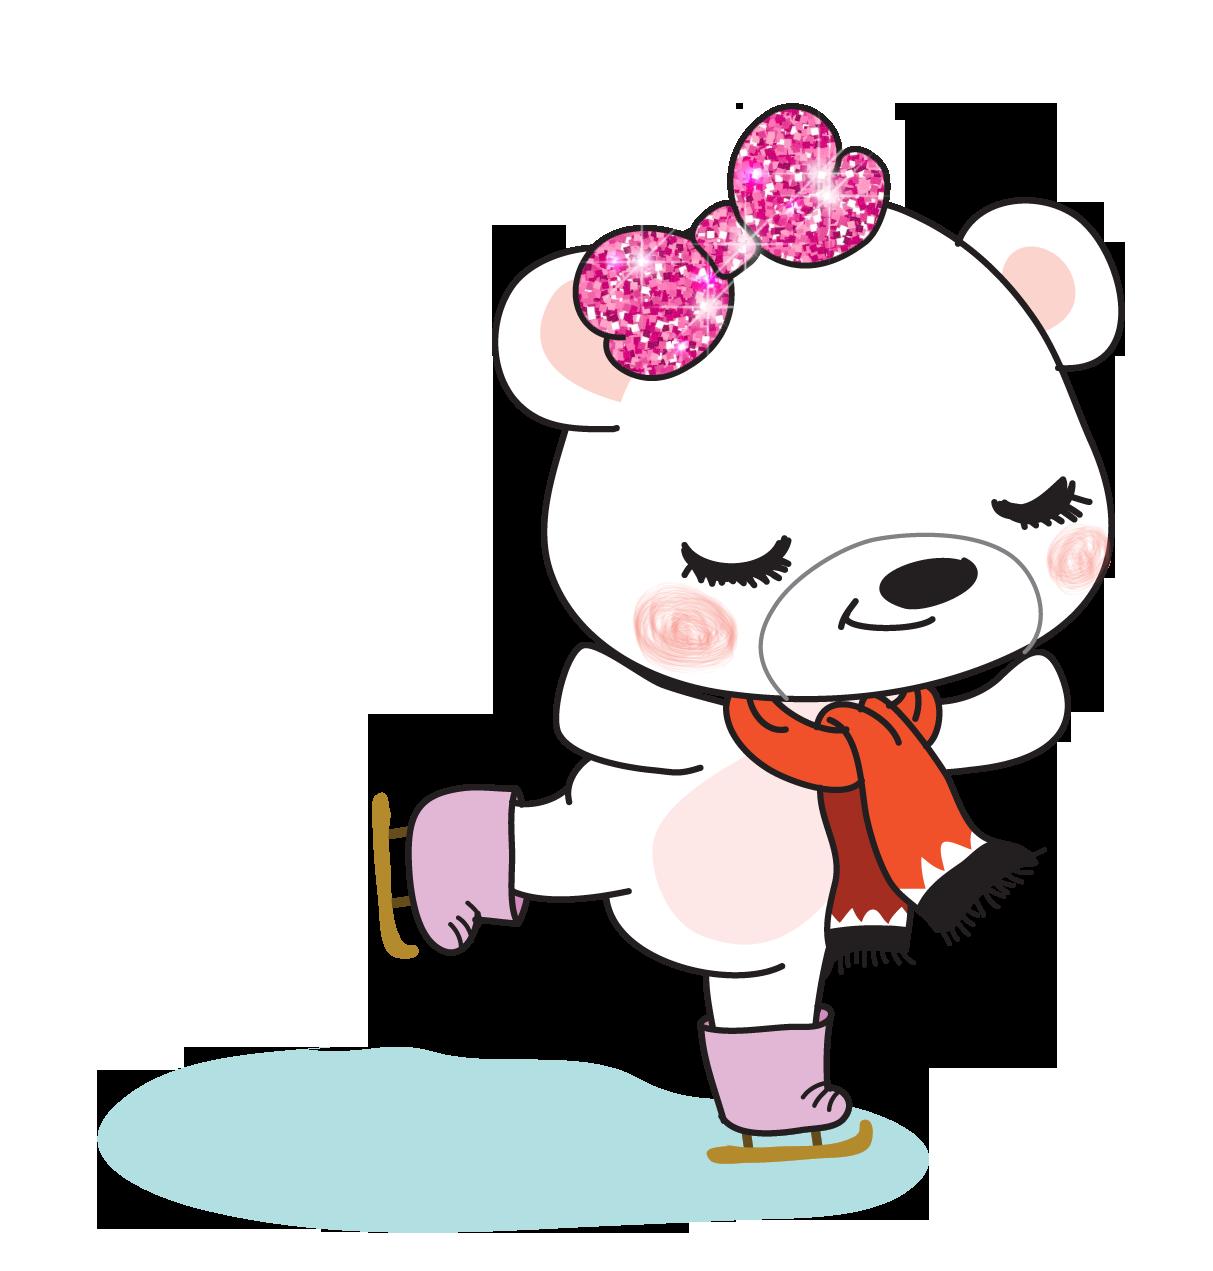 Boo Bear Ice Skate In 2021 Glossy Sticker Paper Sticker Paper Ice Skating